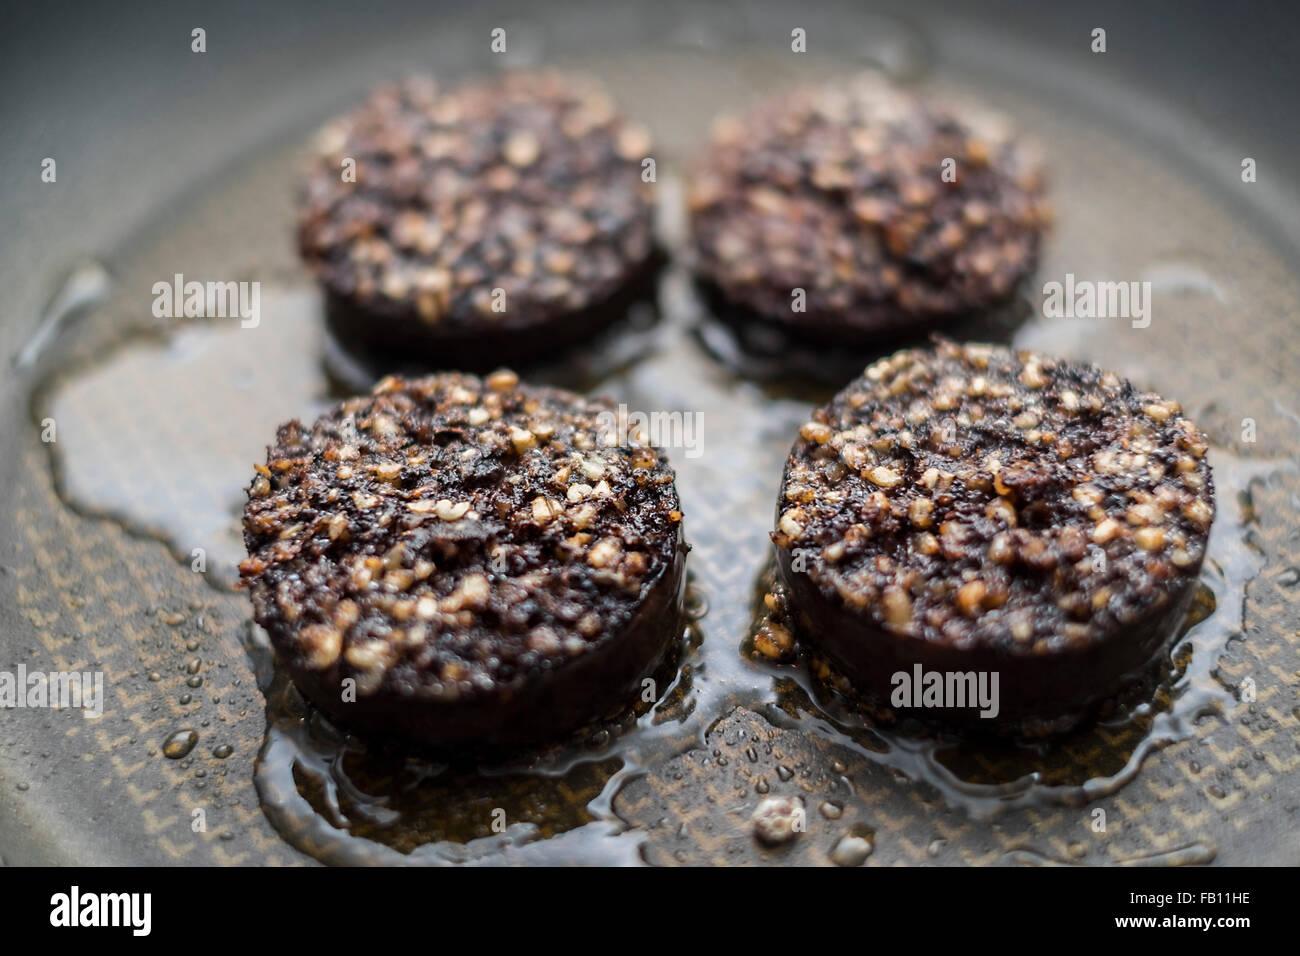 A Black Pudding sausage - Stock Image